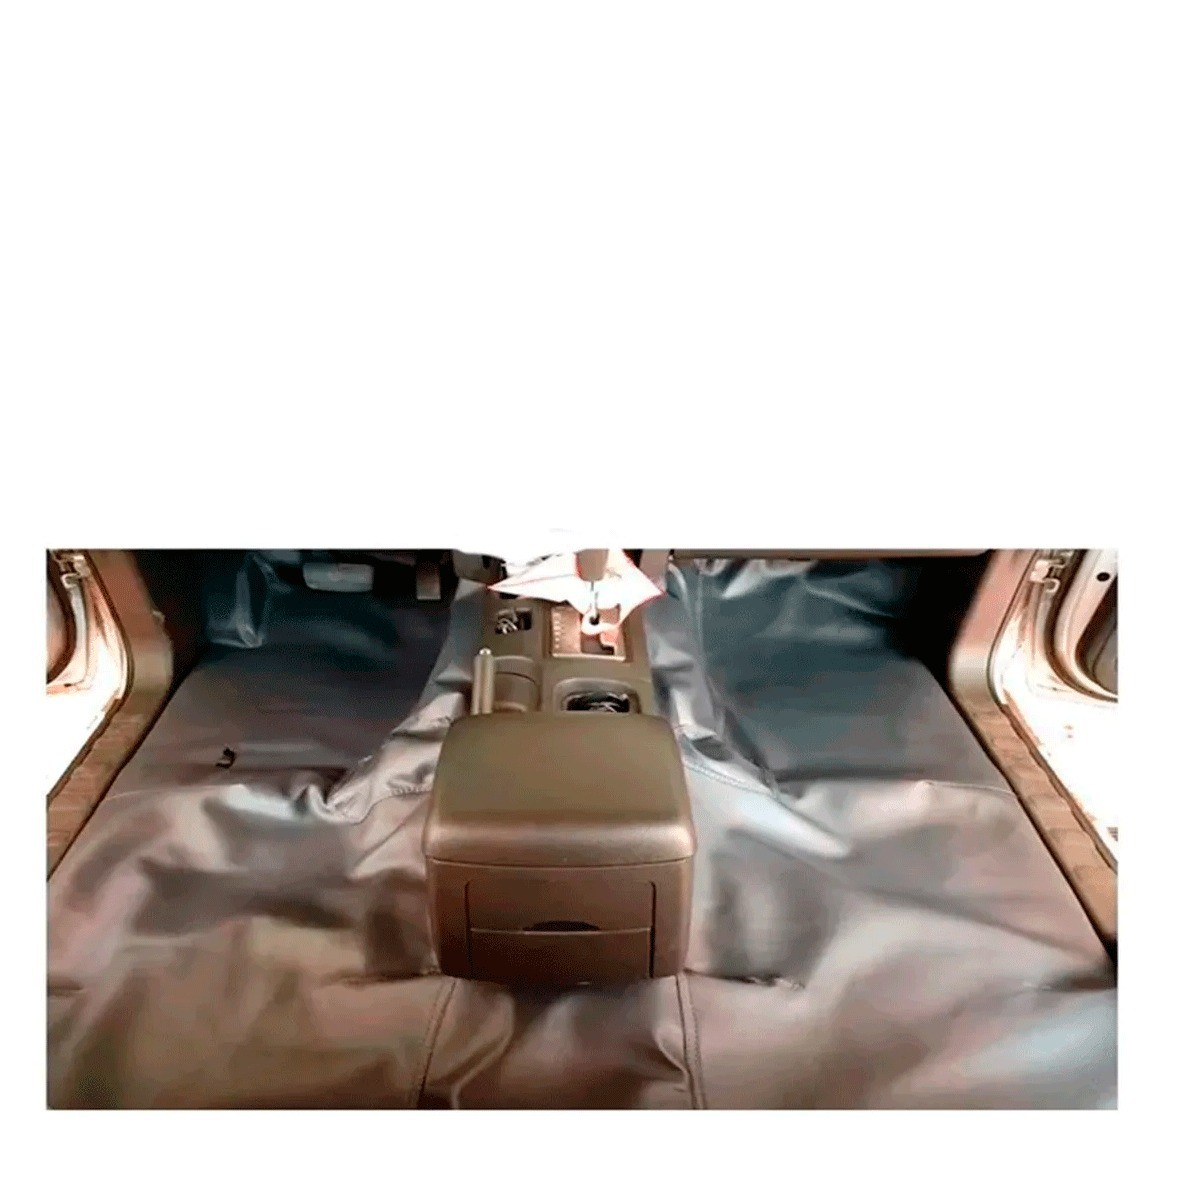 Tapete Automotivo Assoalho Emborrachado Bidim Ford Pampa